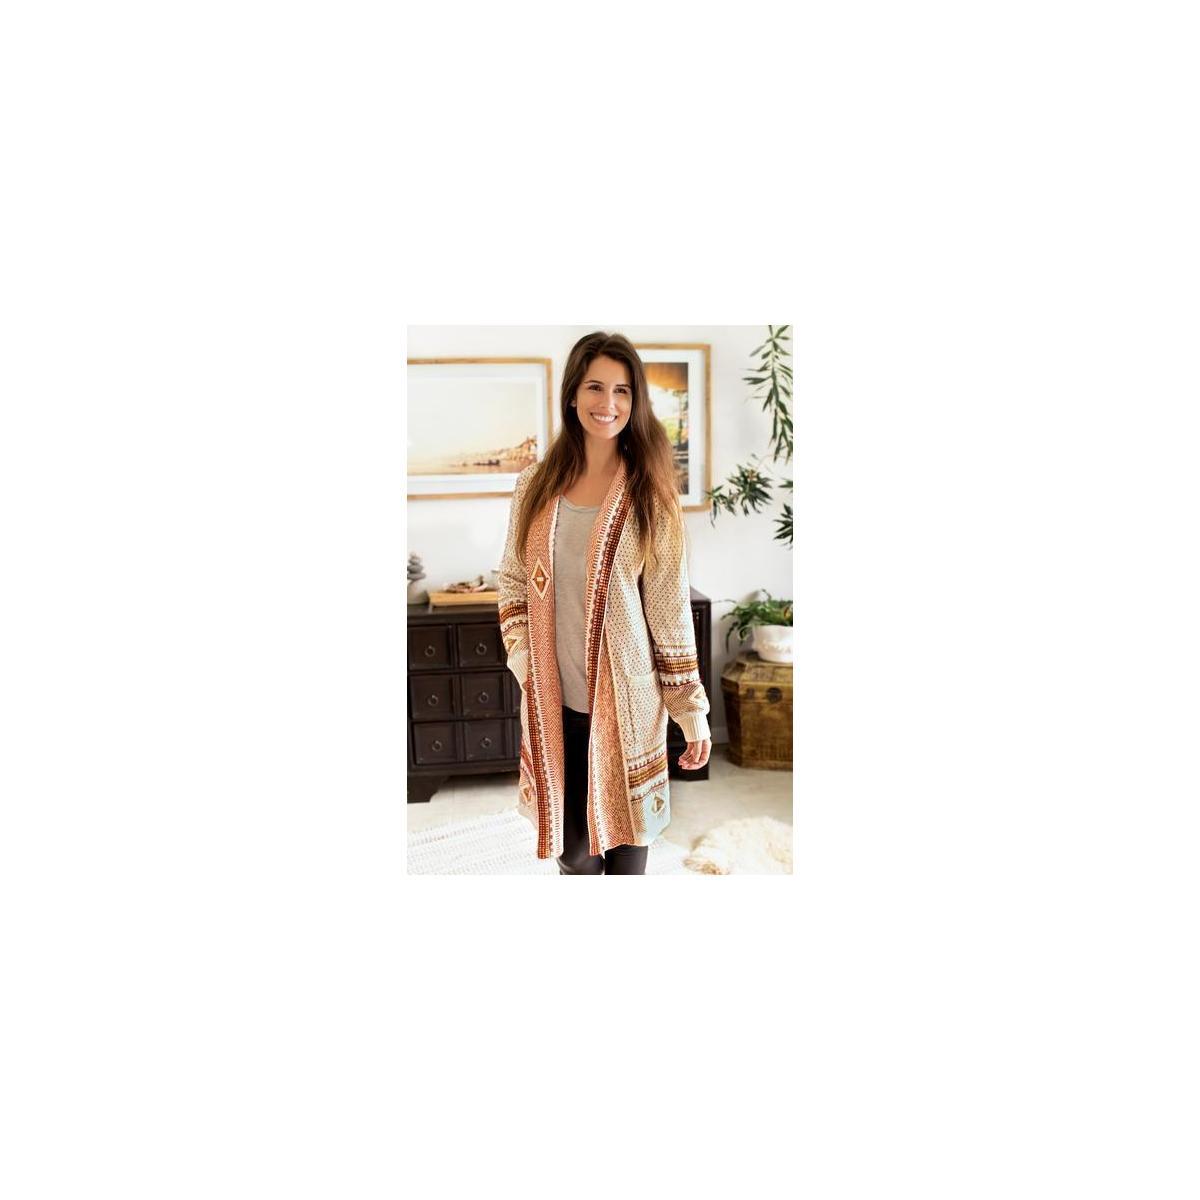 Happy Trunks Womens Boho Cardigan Sweaters Long Sleeve Open Front Maxi Knit Aztec Tribal Fringe Thin Coat